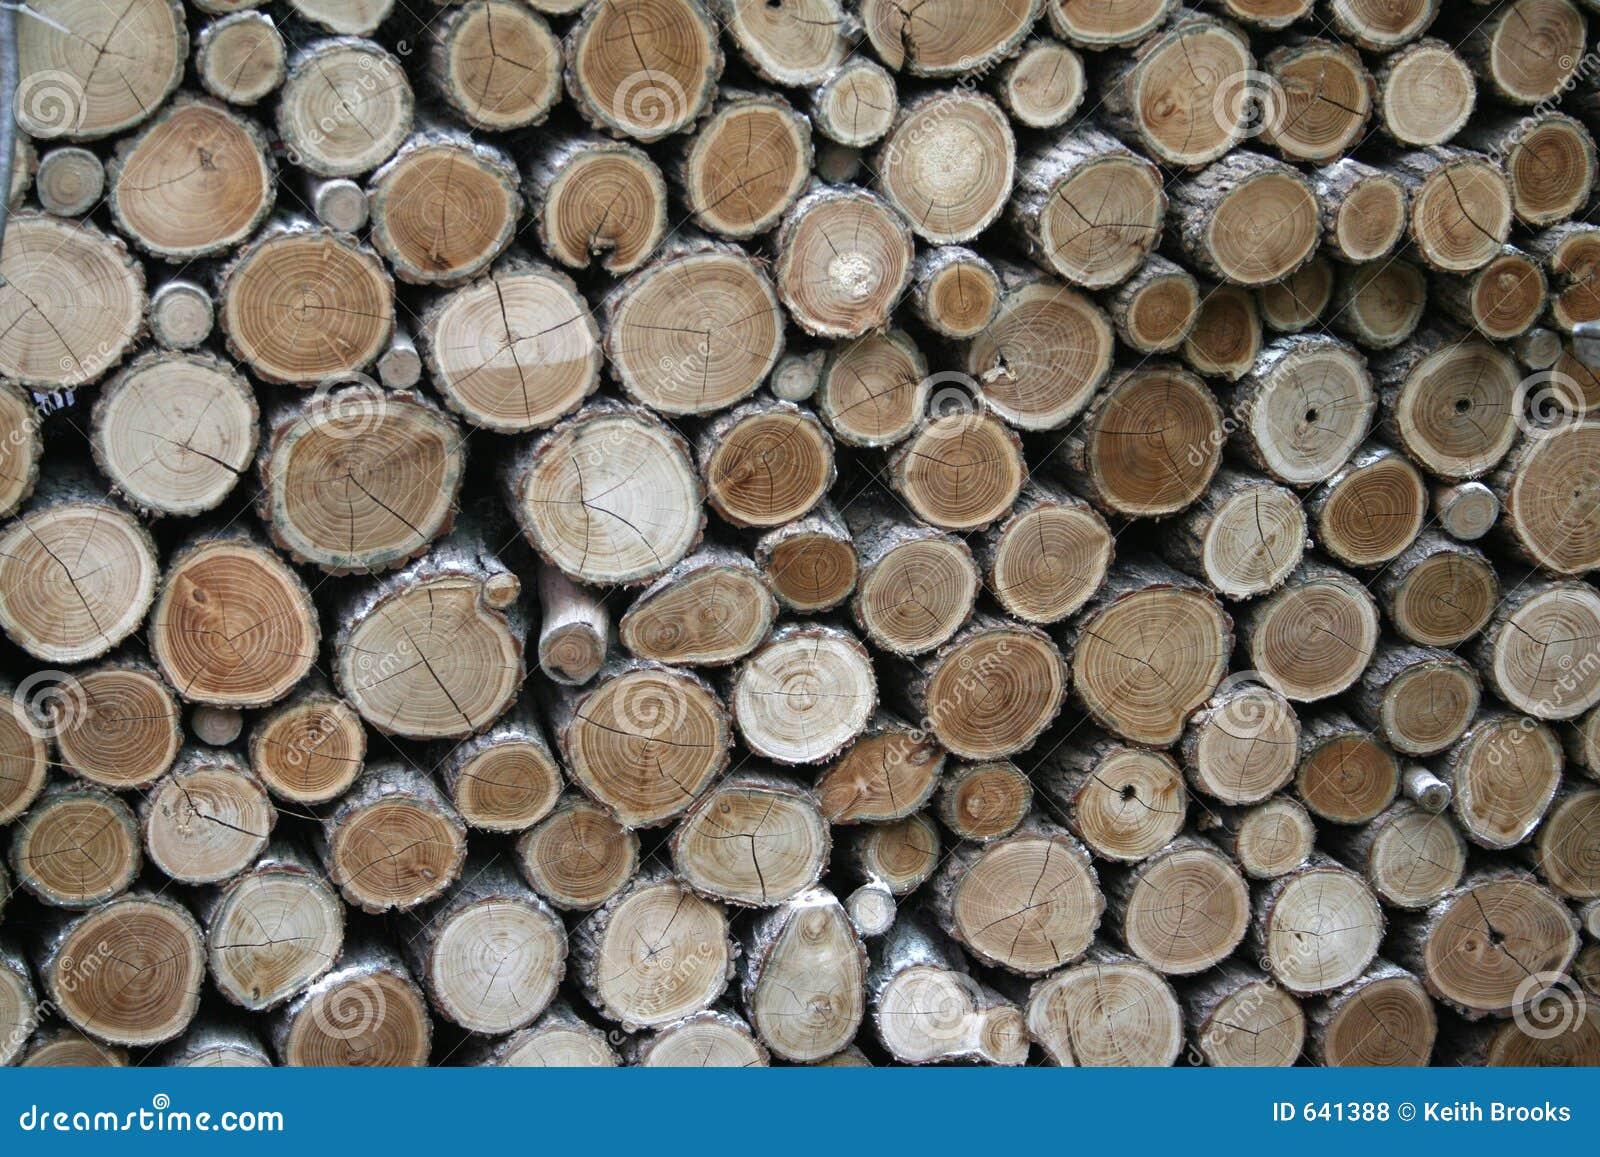 Wood Pile Royalty Free Stock Photos Image 641388